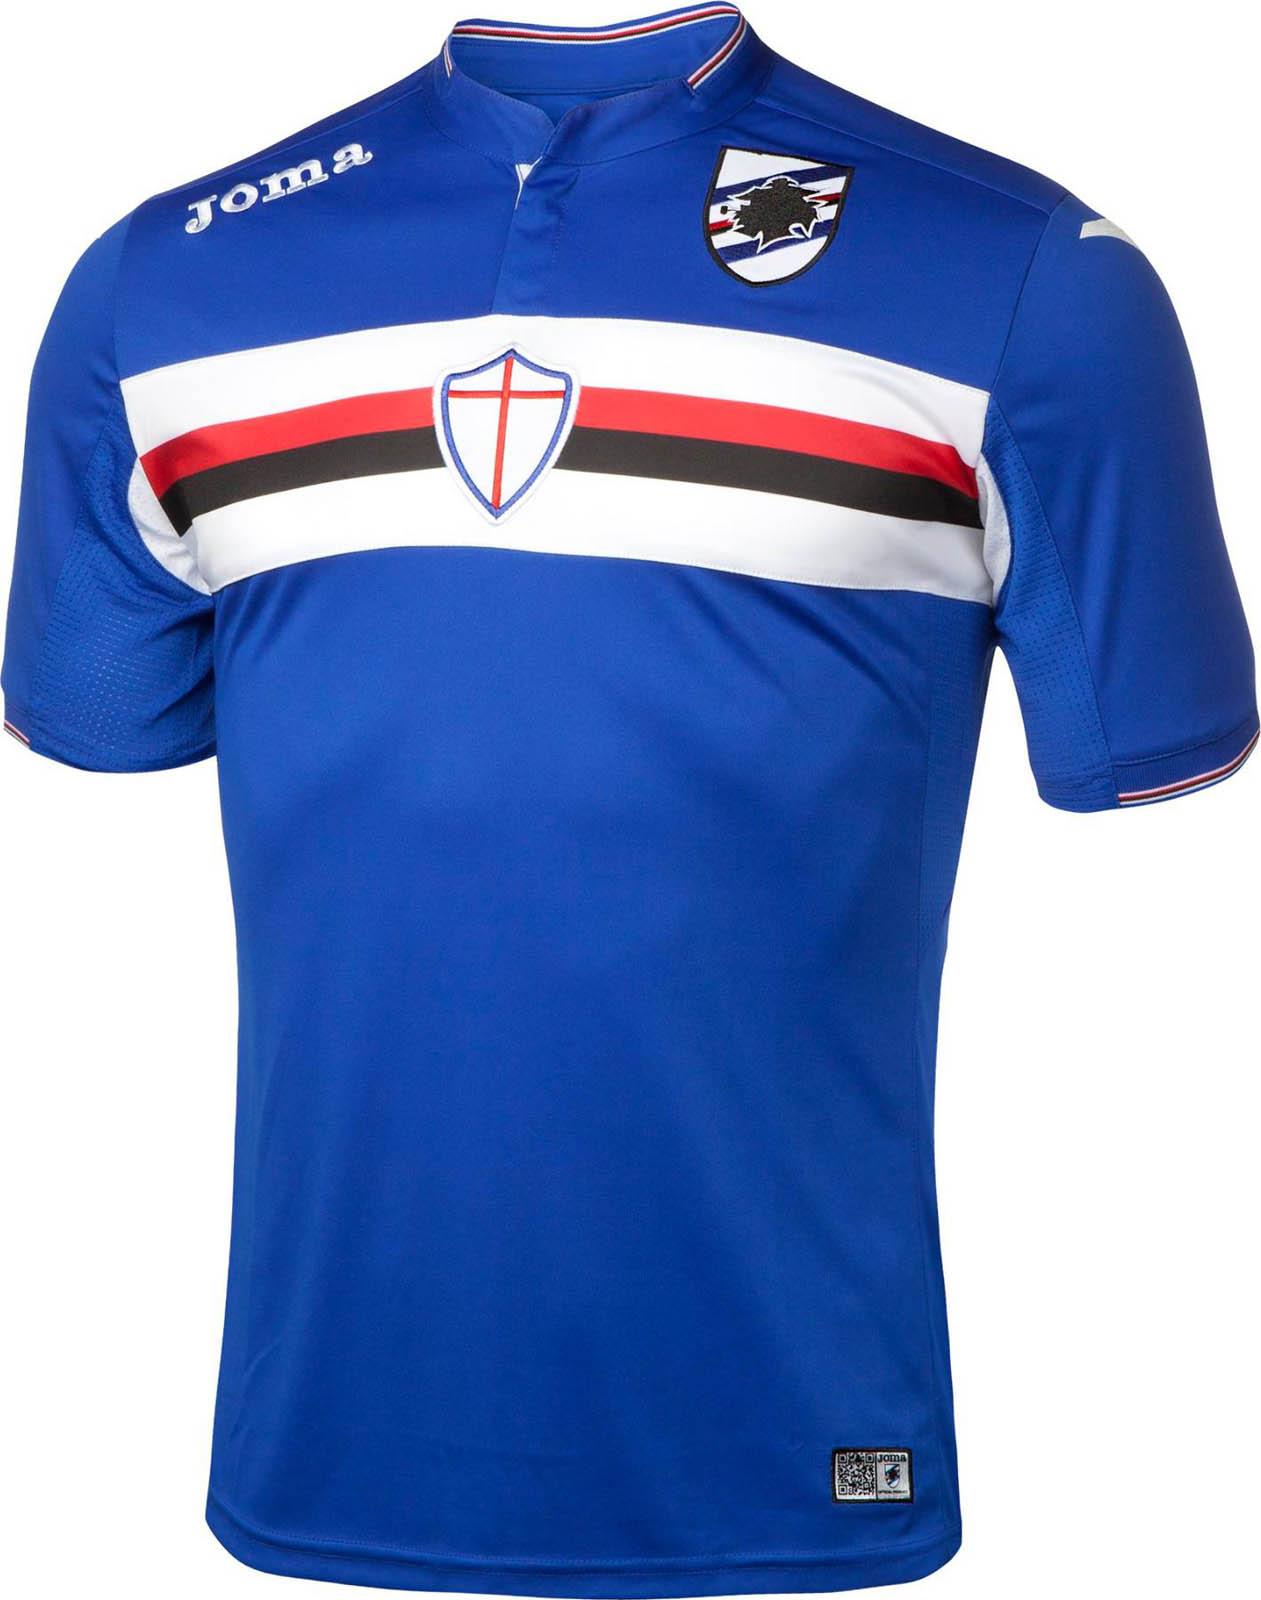 Sampdoria 15-16 Kits Released - Footy Headlines